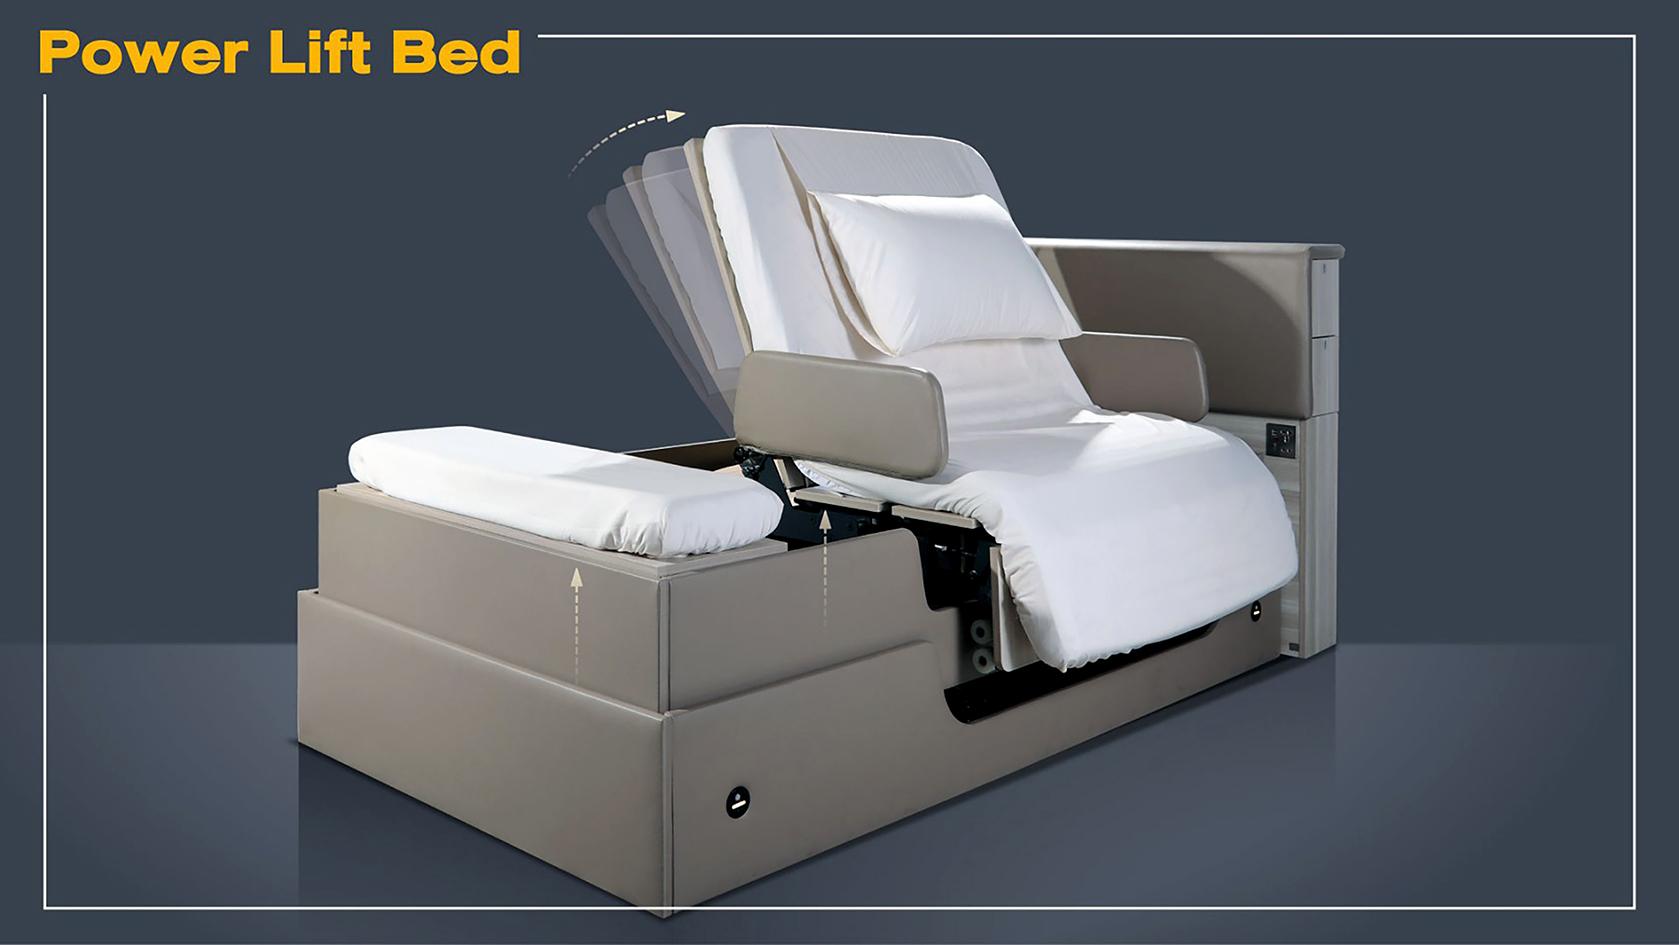 Power Lift Bed นวัตกรรมเตียงนอนสุดล้ำ รับสังคมสูงวัย